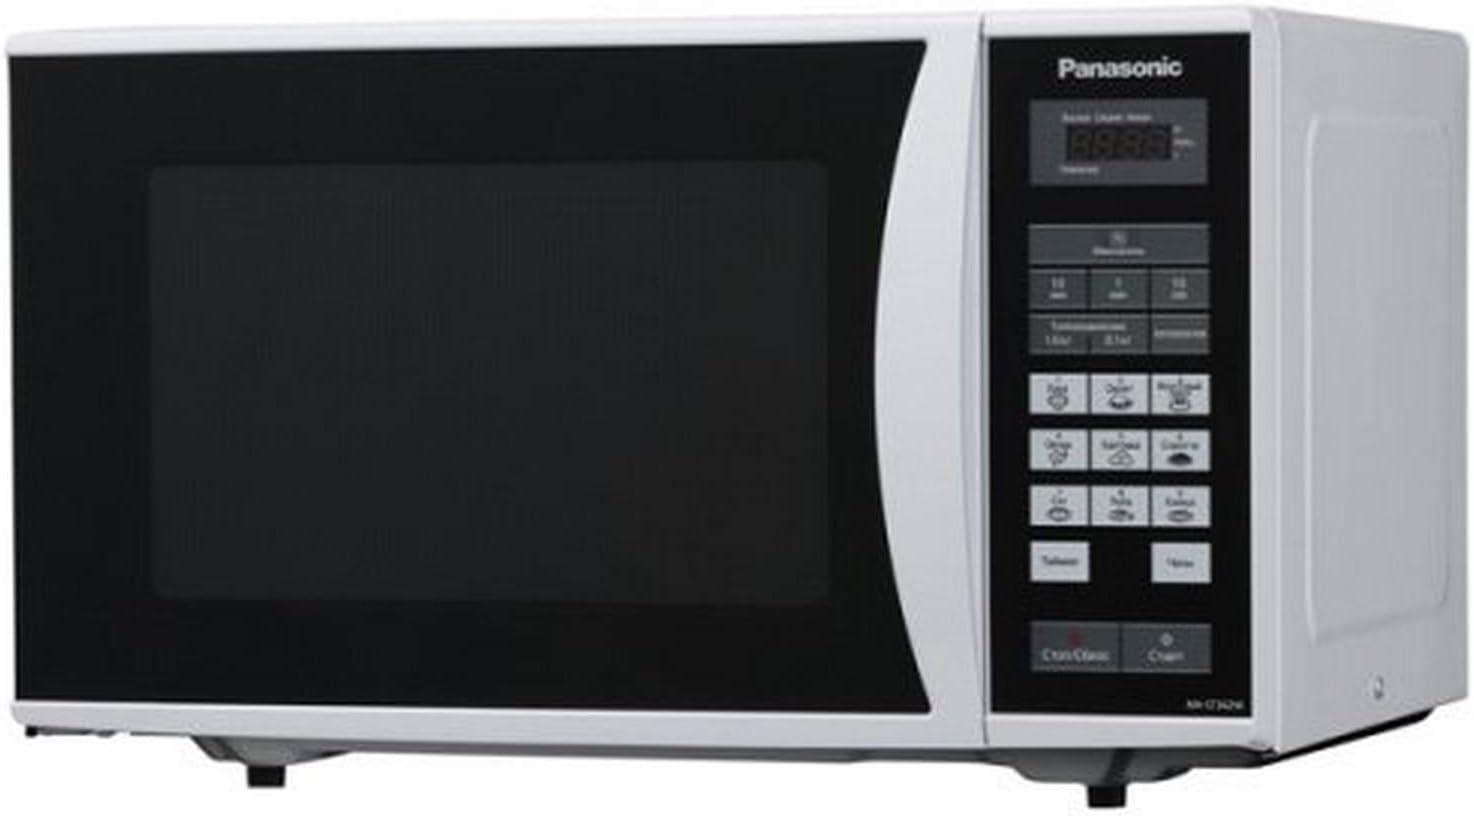 Panasonic nn-st342 m 25-liter microondas horno, 220-volt (Non-usa ...